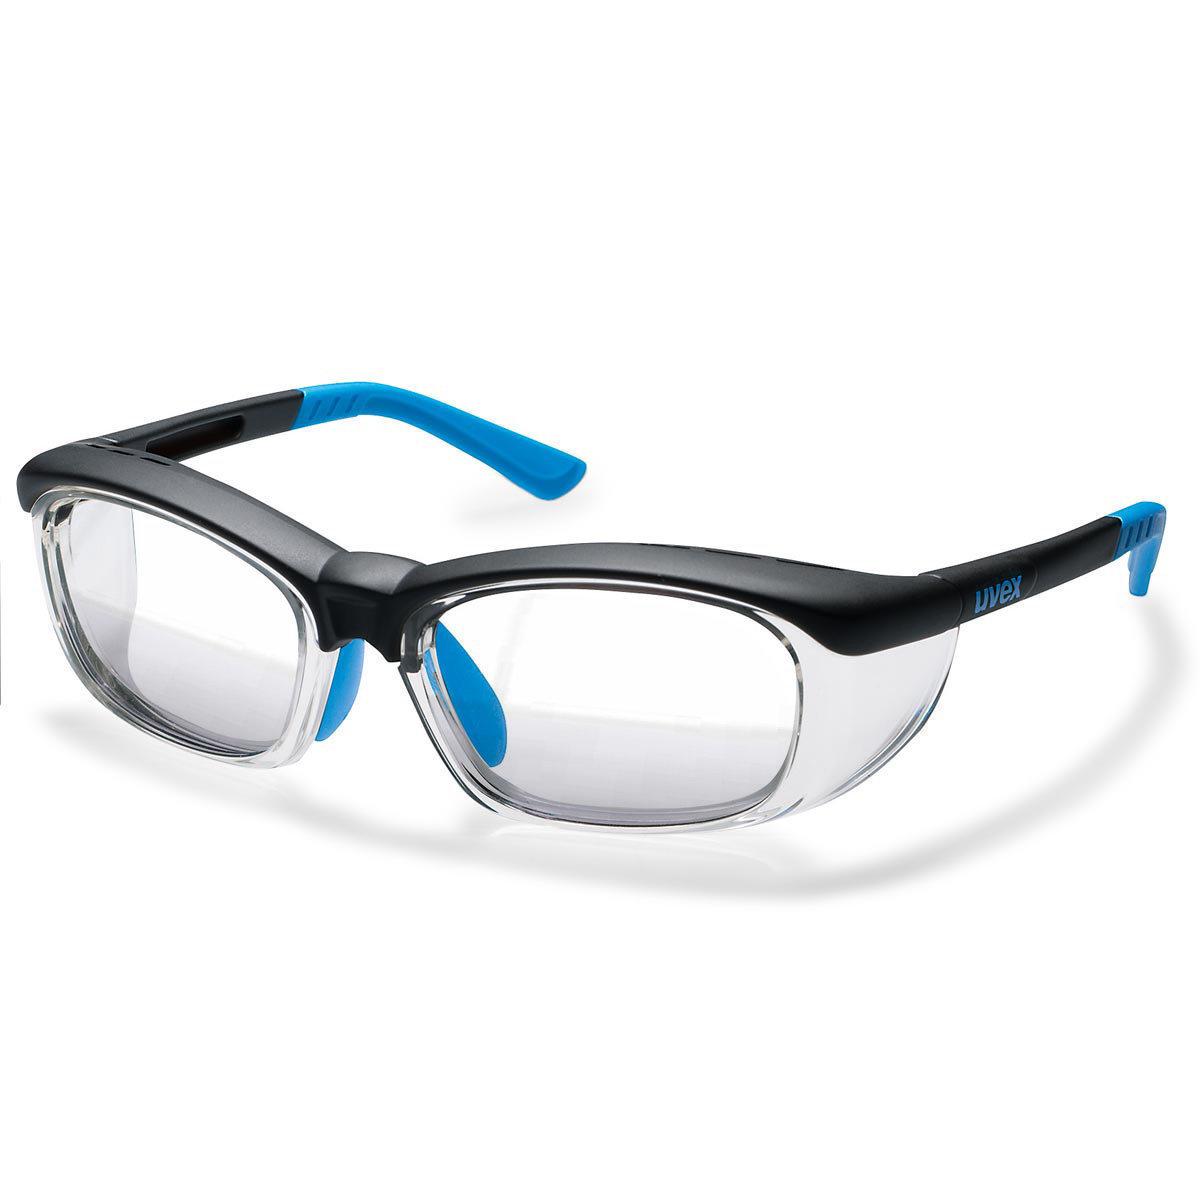 Uvex Korrektionsschutzbrille RX cd 5514 - UV blue protect